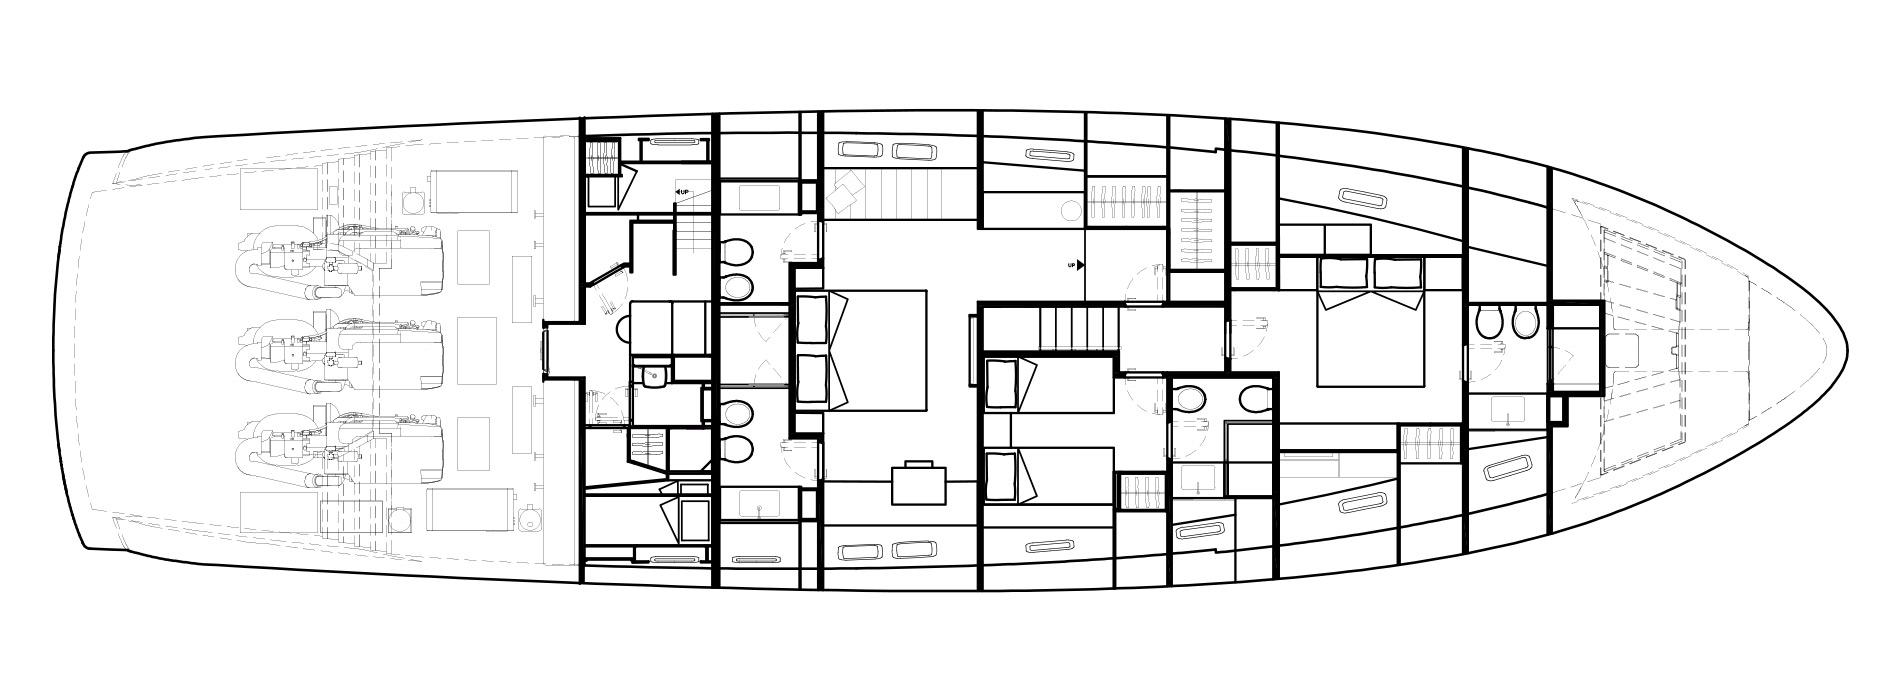 Sanlorenzo Yachts SX88 Lower Deck Version B